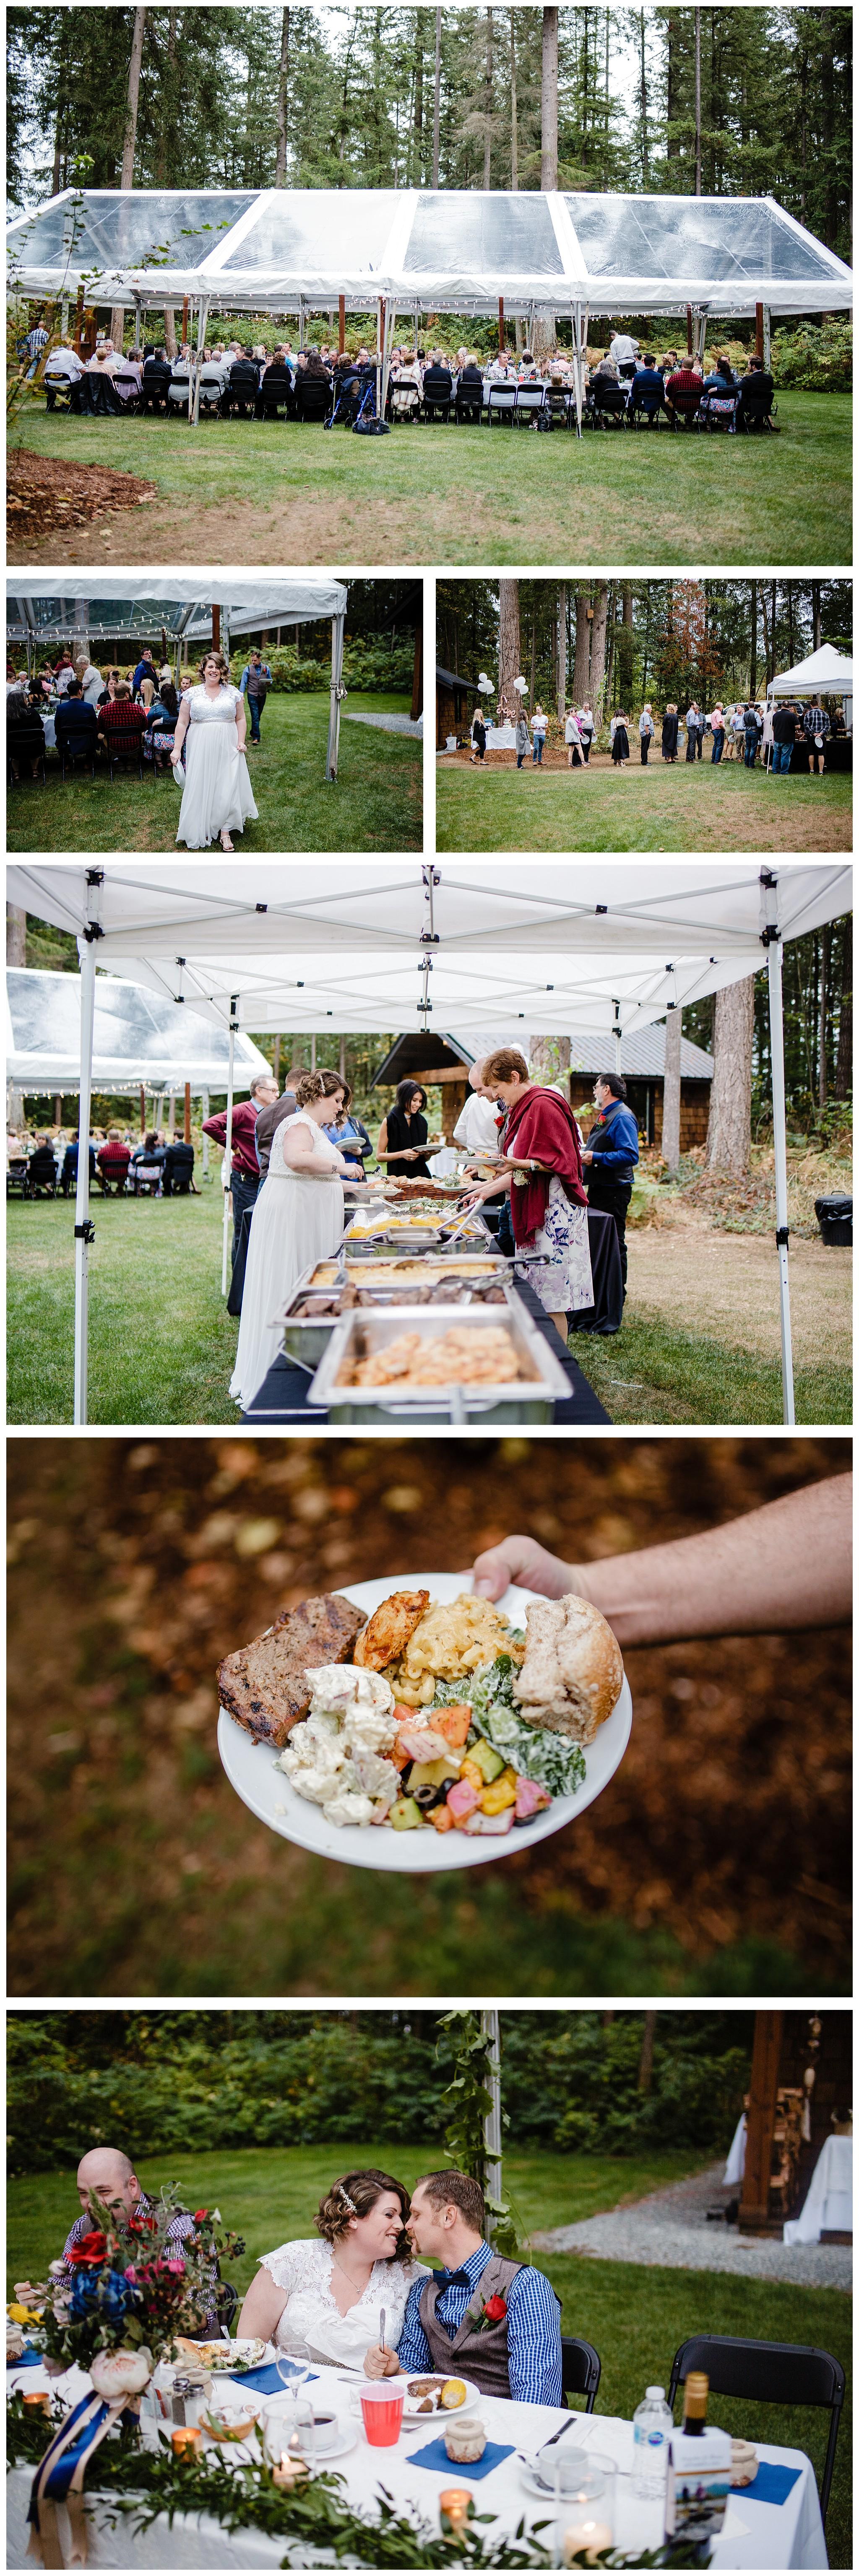 Aldergrove Park Fall Backyard Wedding Photographer Pregnant Bride Tent Outdoor BC Canada Best Wedding Photographer_0046.jpg